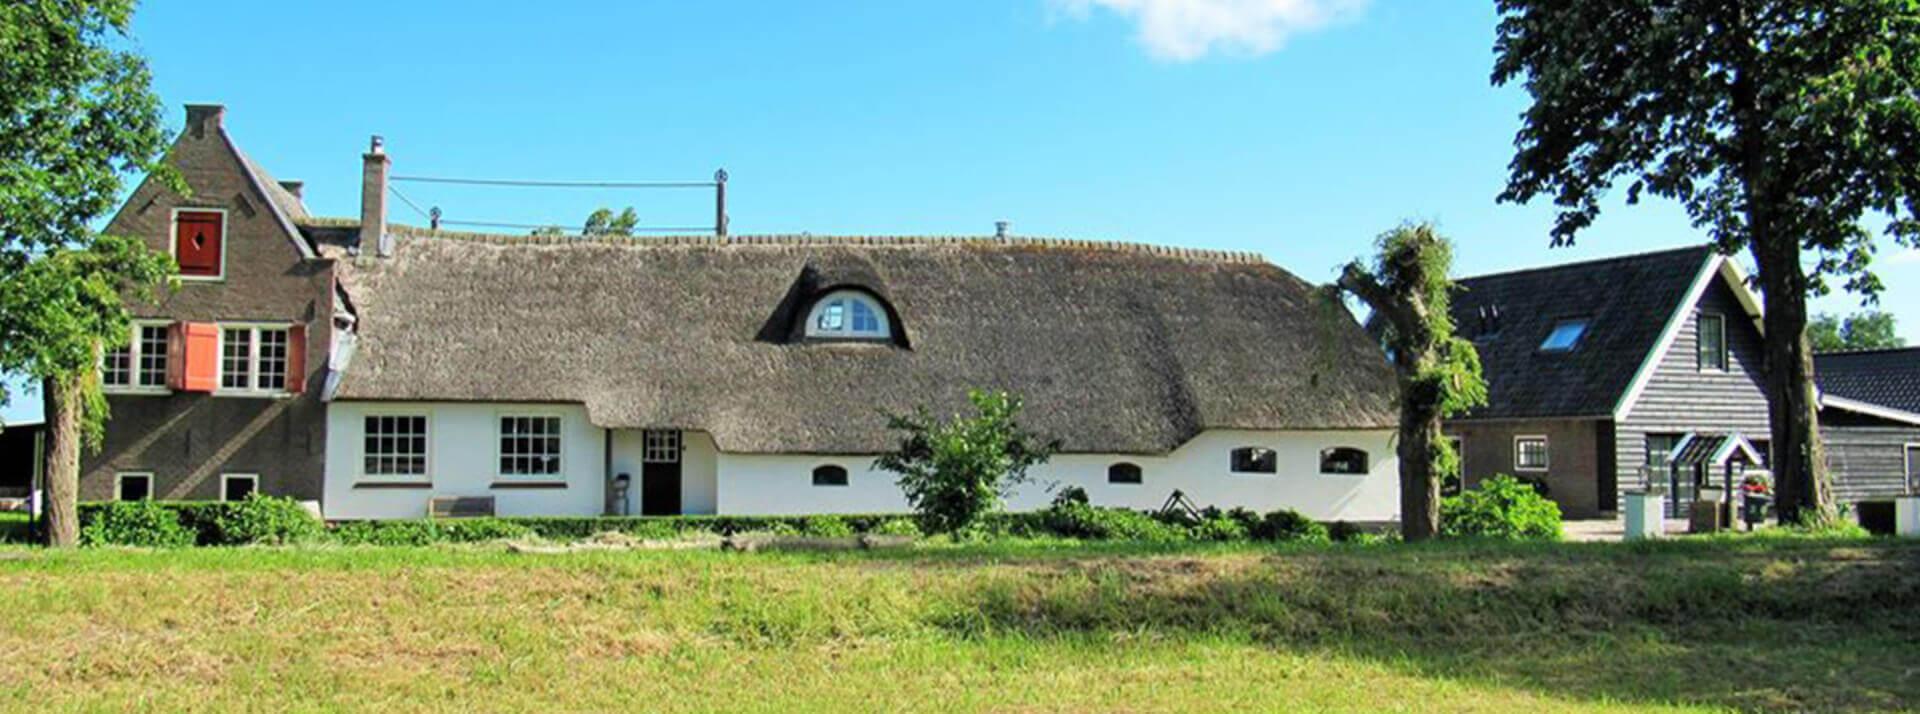 boerderij-honswijck-banner-home